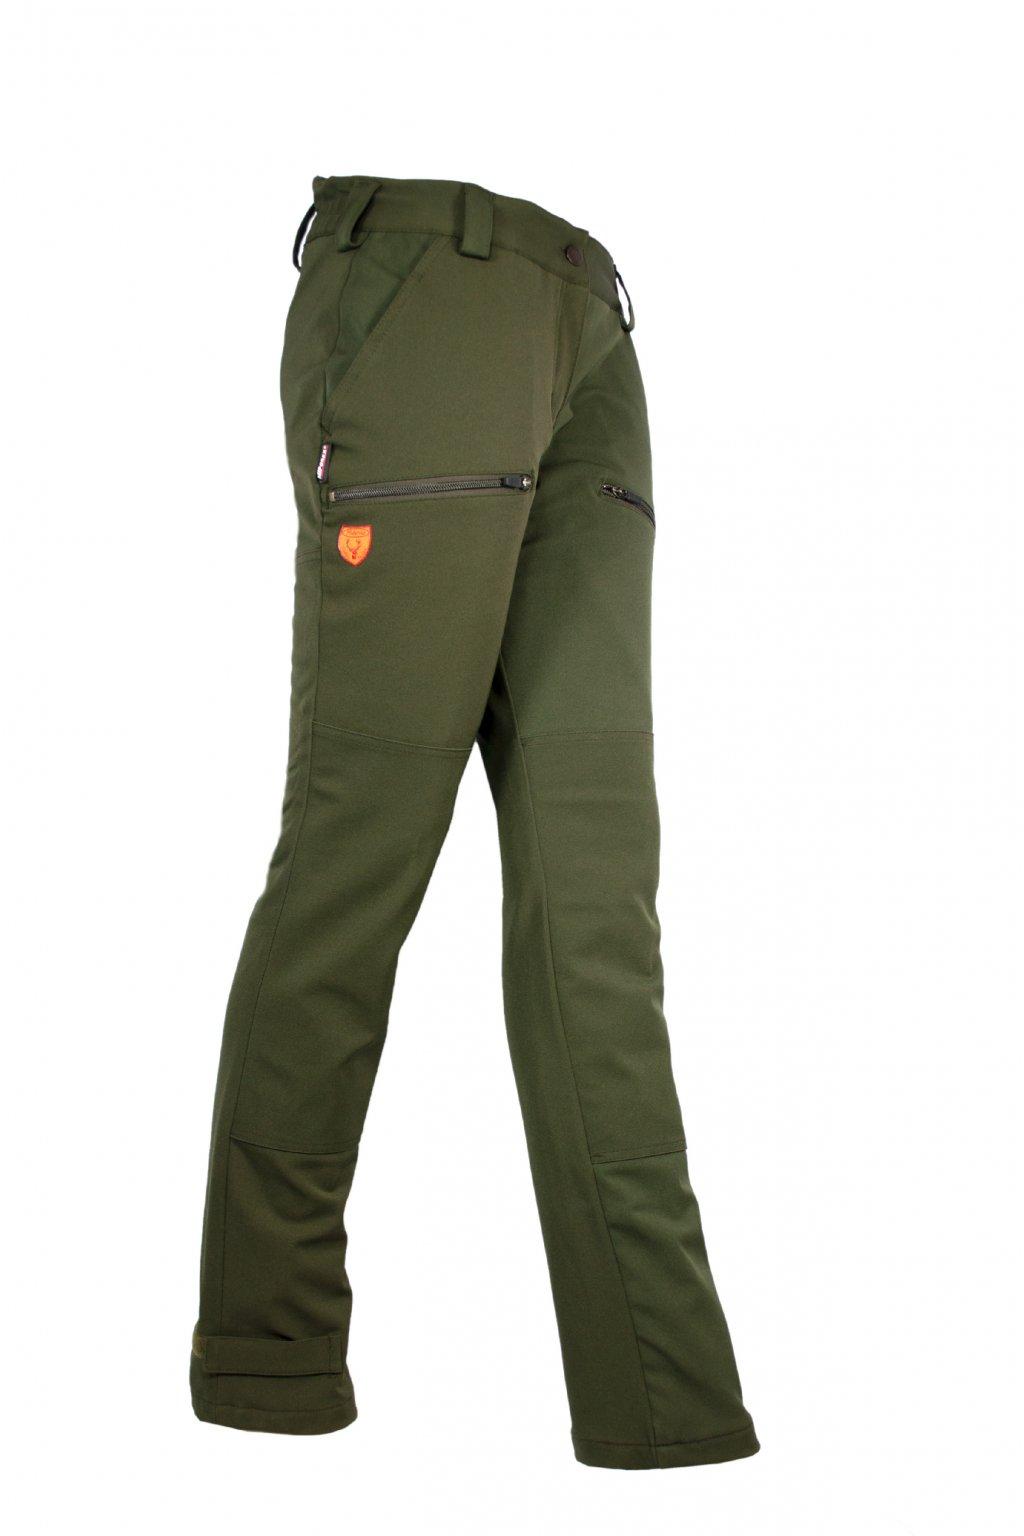 HUBERTUS - dámské kalhoty ARTEMIS s  Miporex® membránou